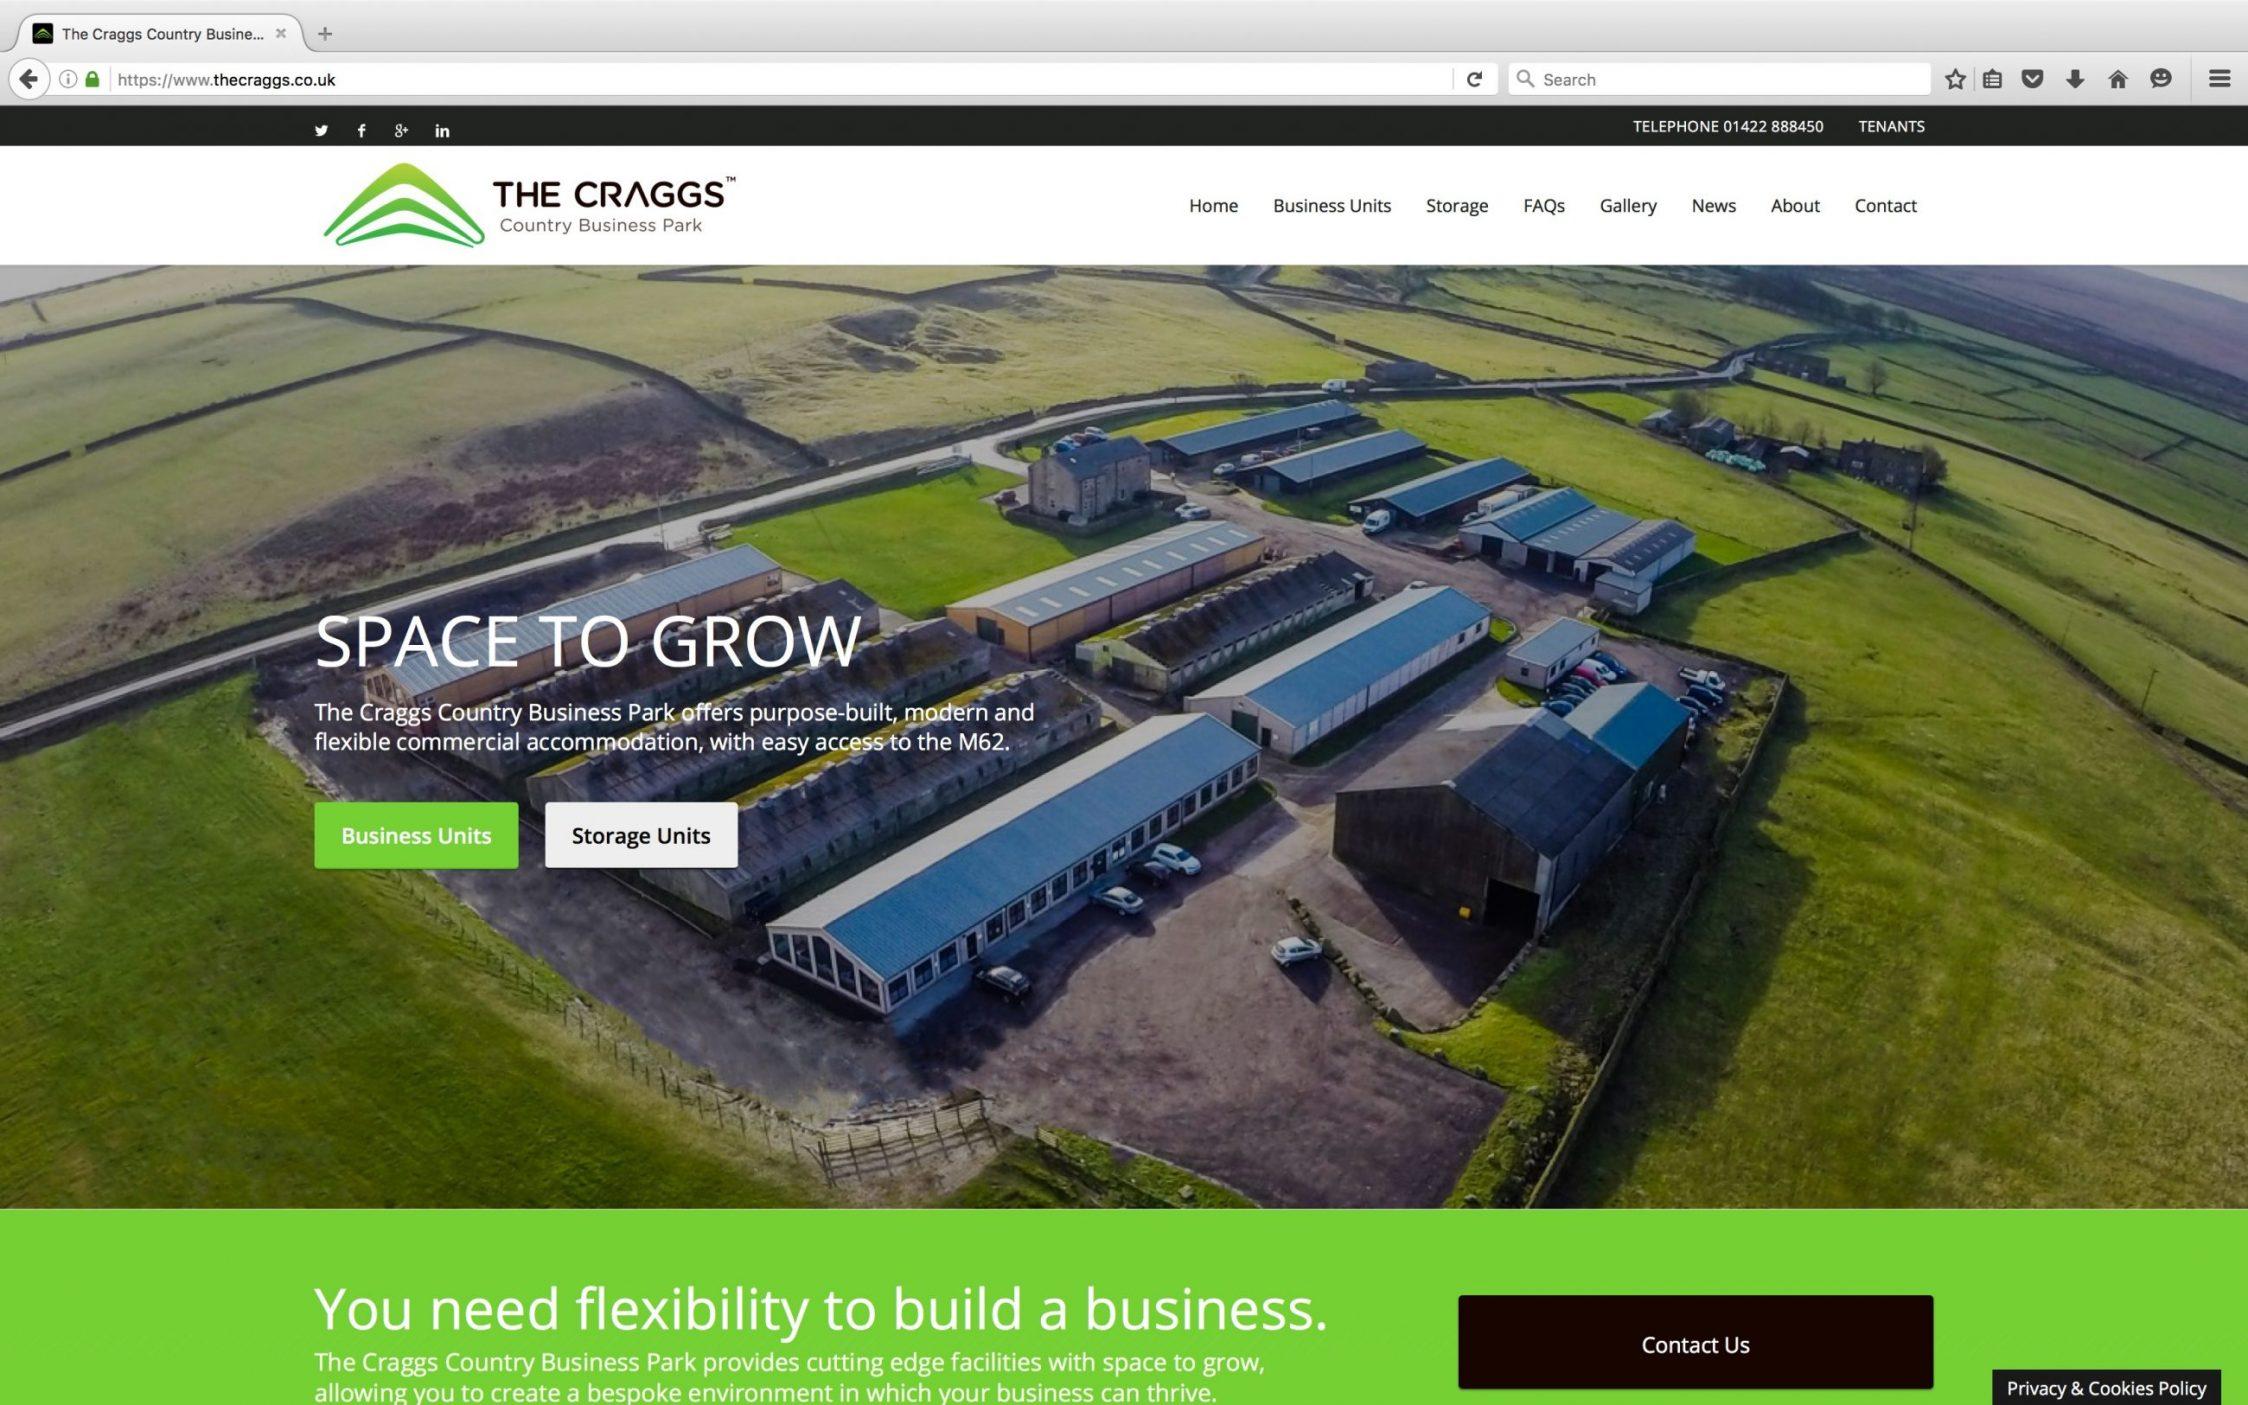 Screen Shot 2016 03 21 at 15.21.48 1 - Website design for business park in Yorkshire